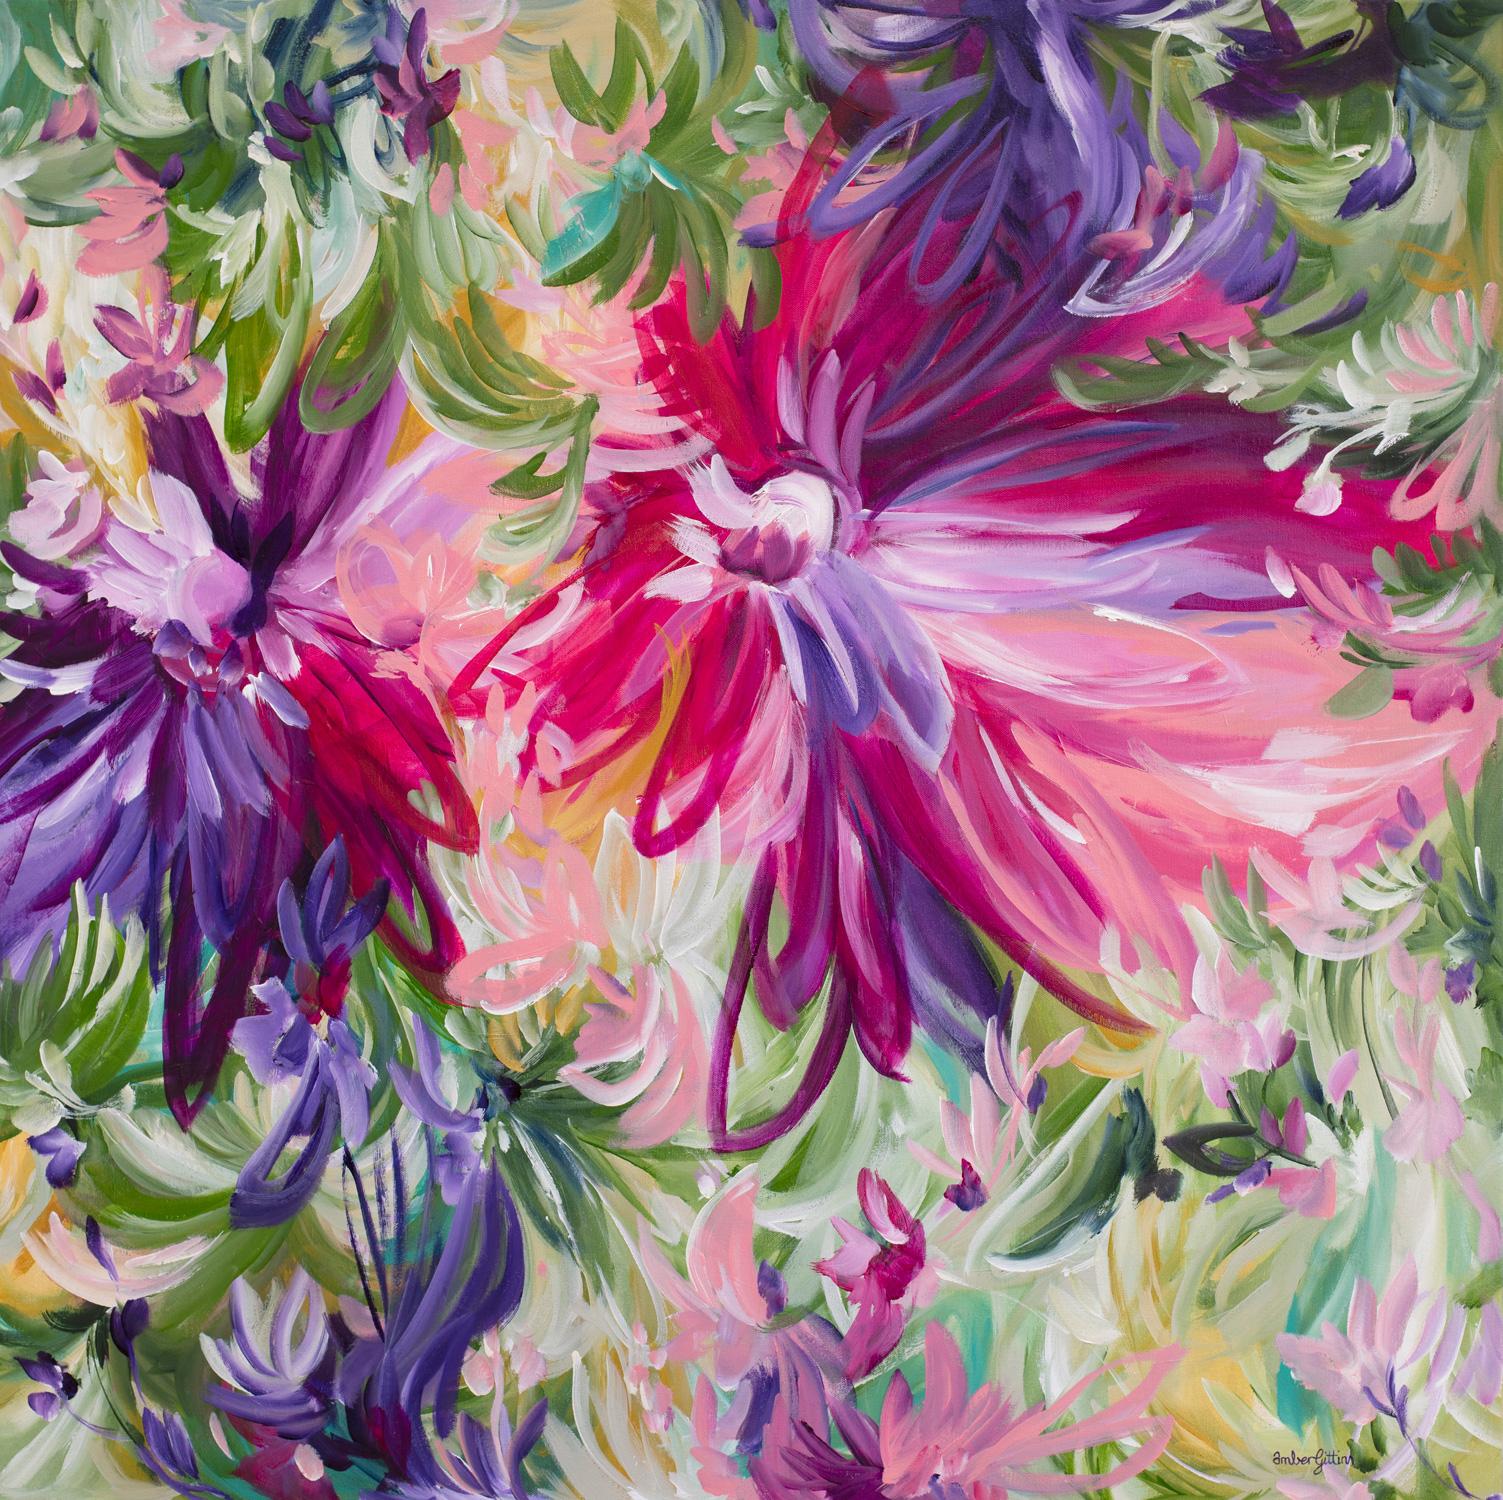 Addictive Blooms By Amber Gittins